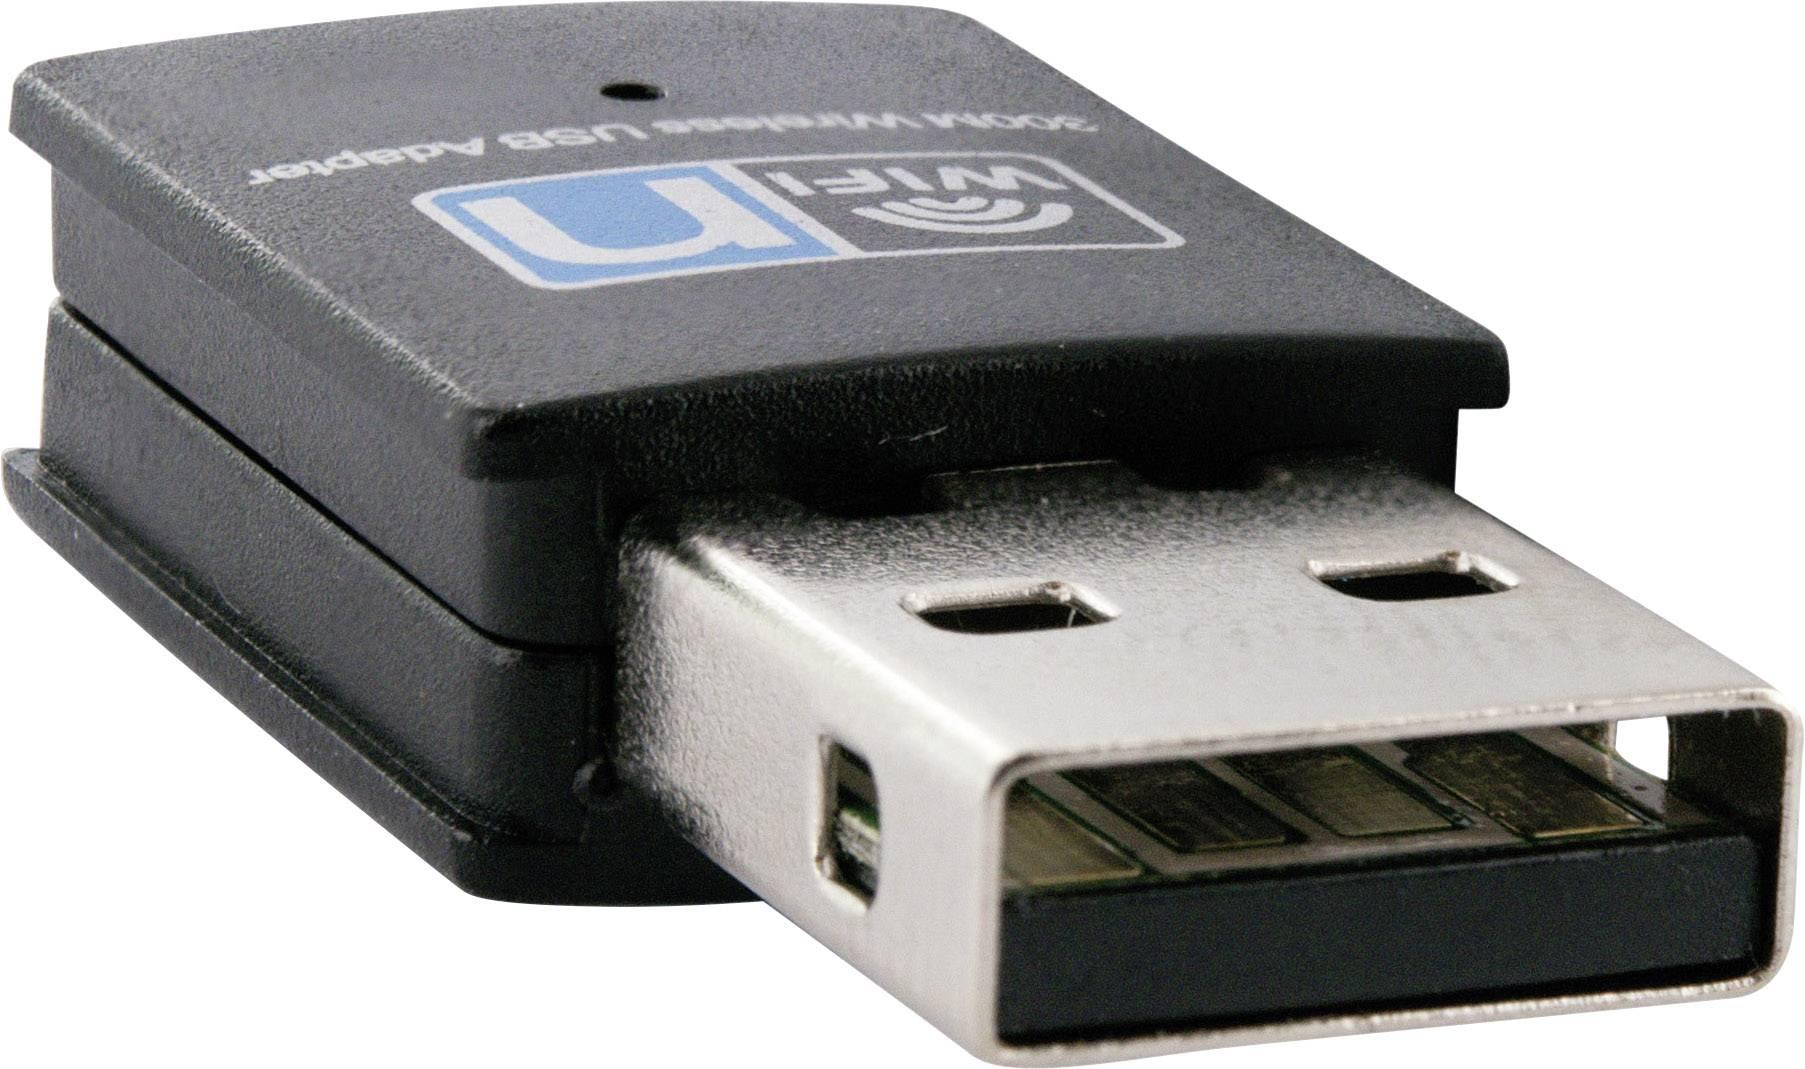 USB 2.0 Wi-Fi adaptér Schwaiger DTR 300, 300 Mbit/s